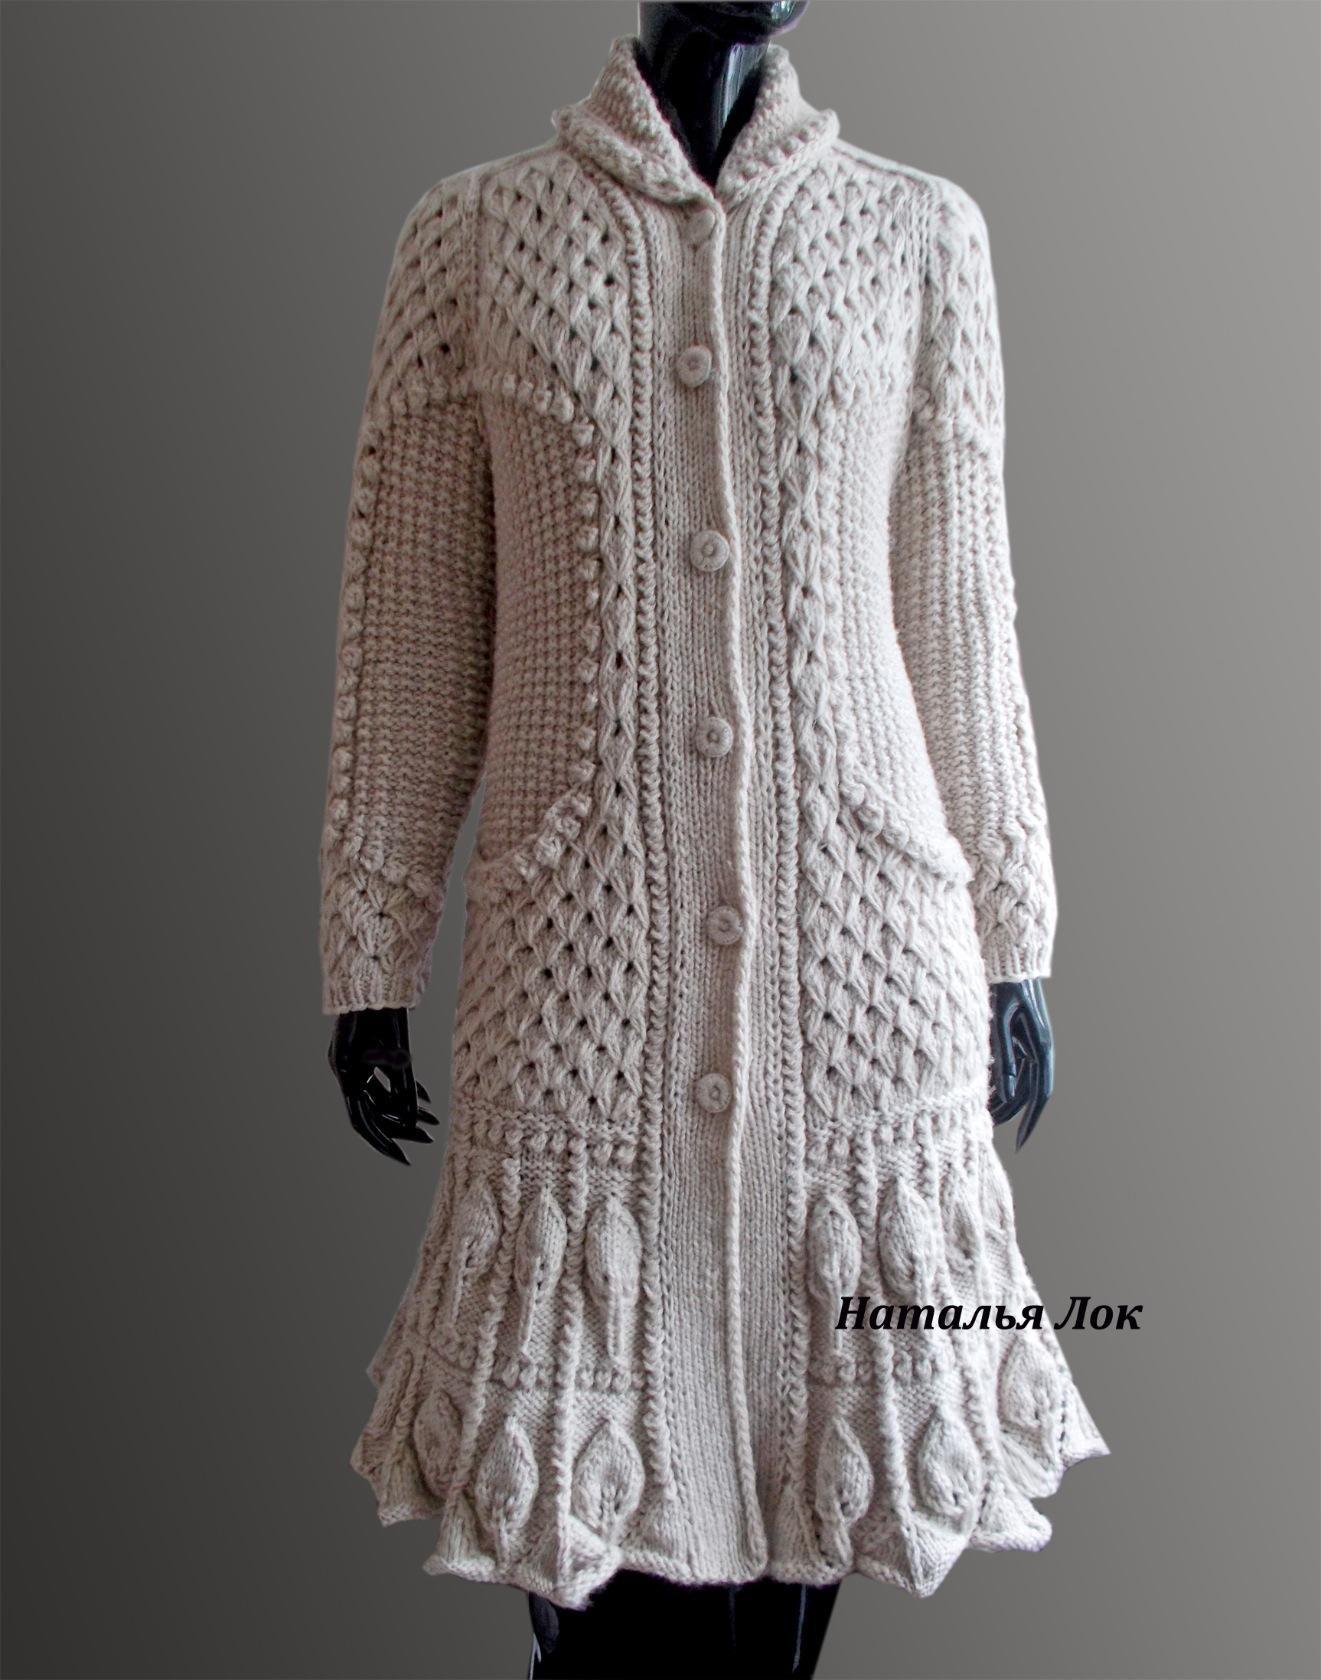 наталья лок вязаные изделия Okru Knitting And Crochet Knit